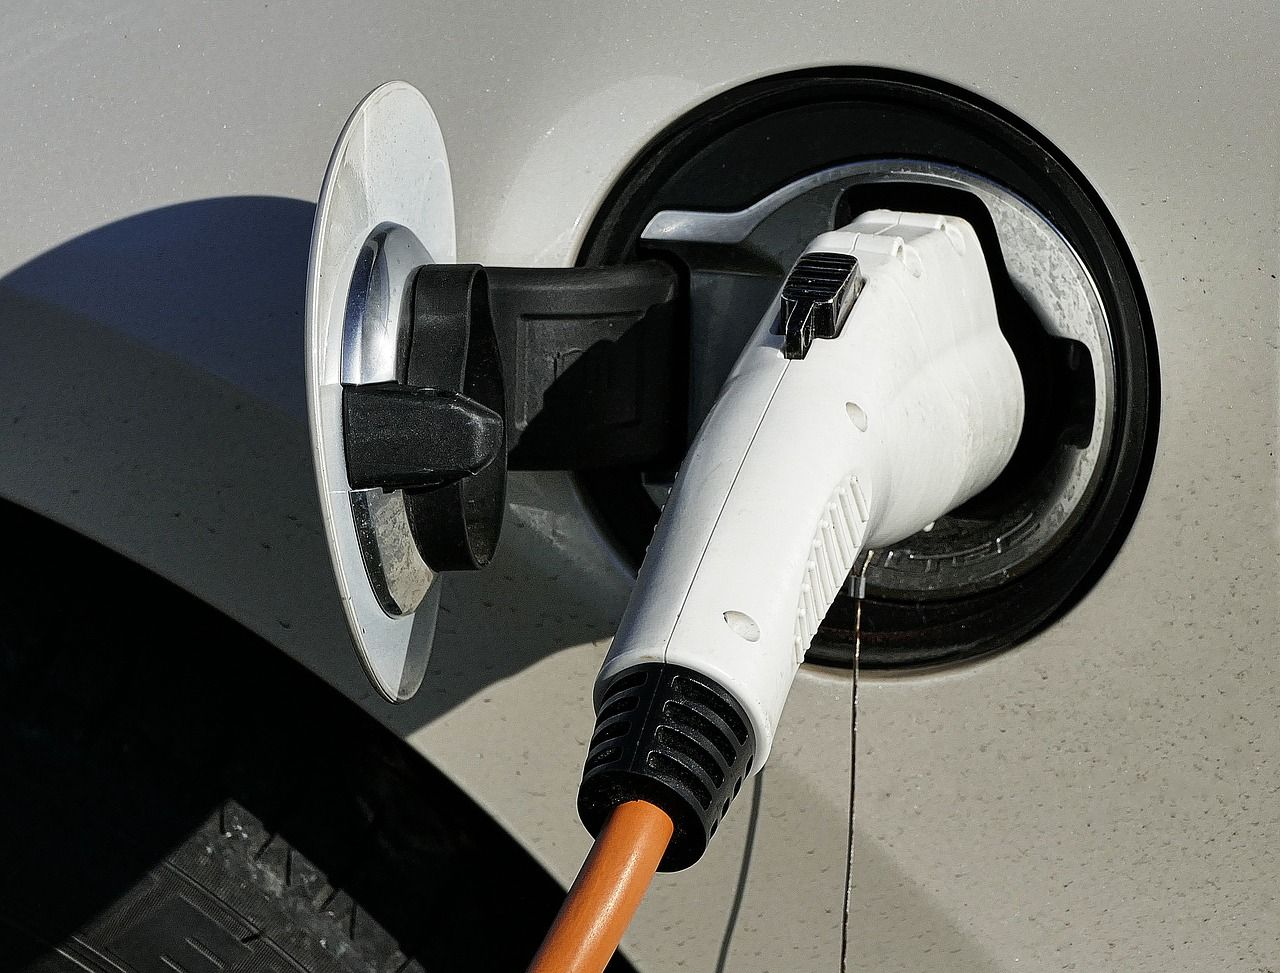 Electric Car 2862381 1280